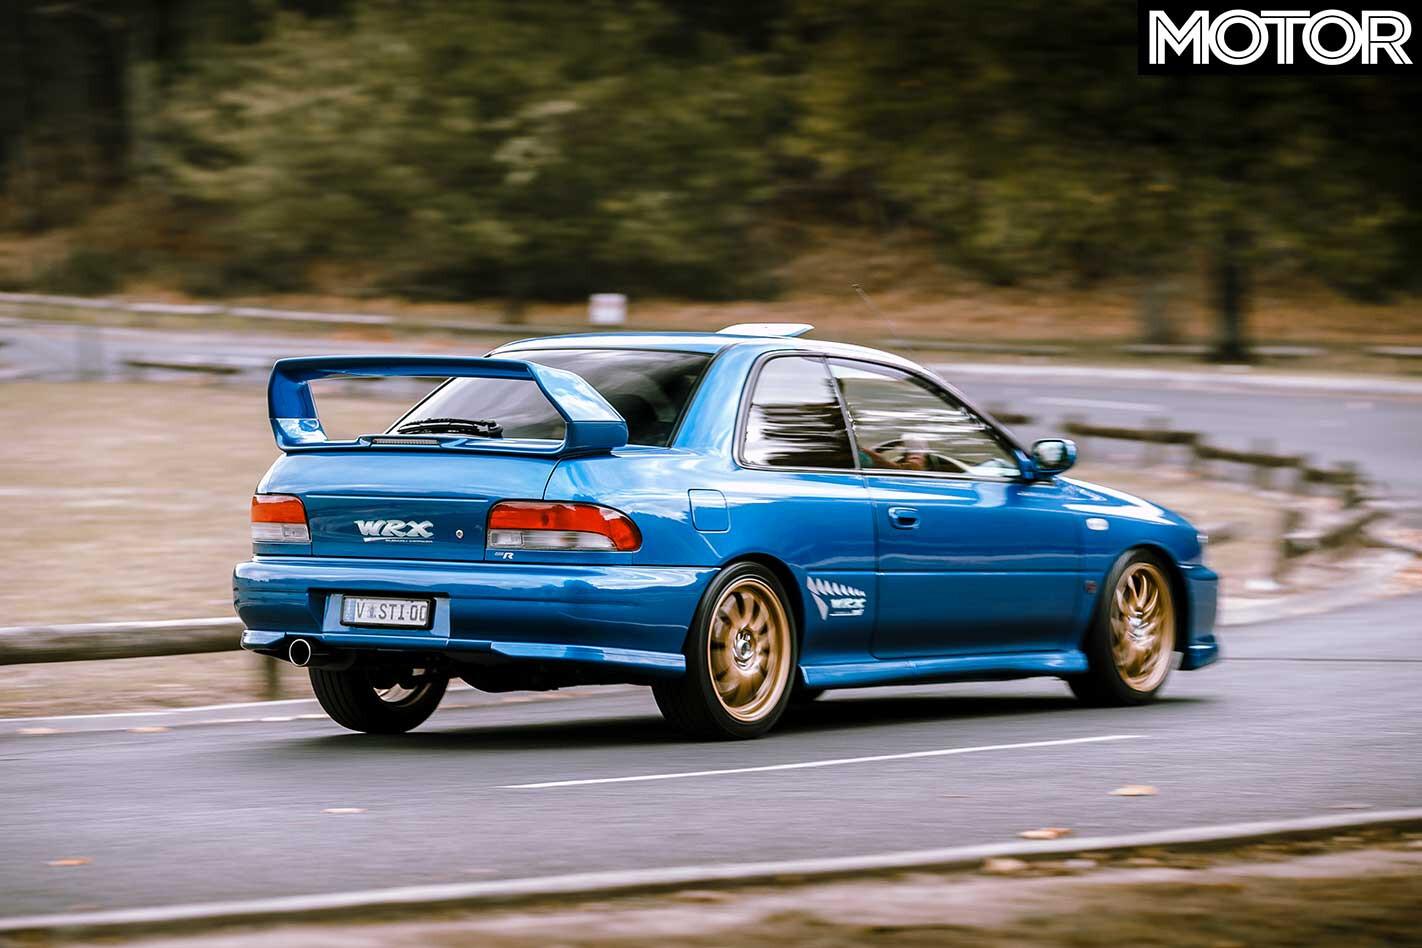 2000 Subaru Impreza WRX S Ti Type R Rear Handling Jpg